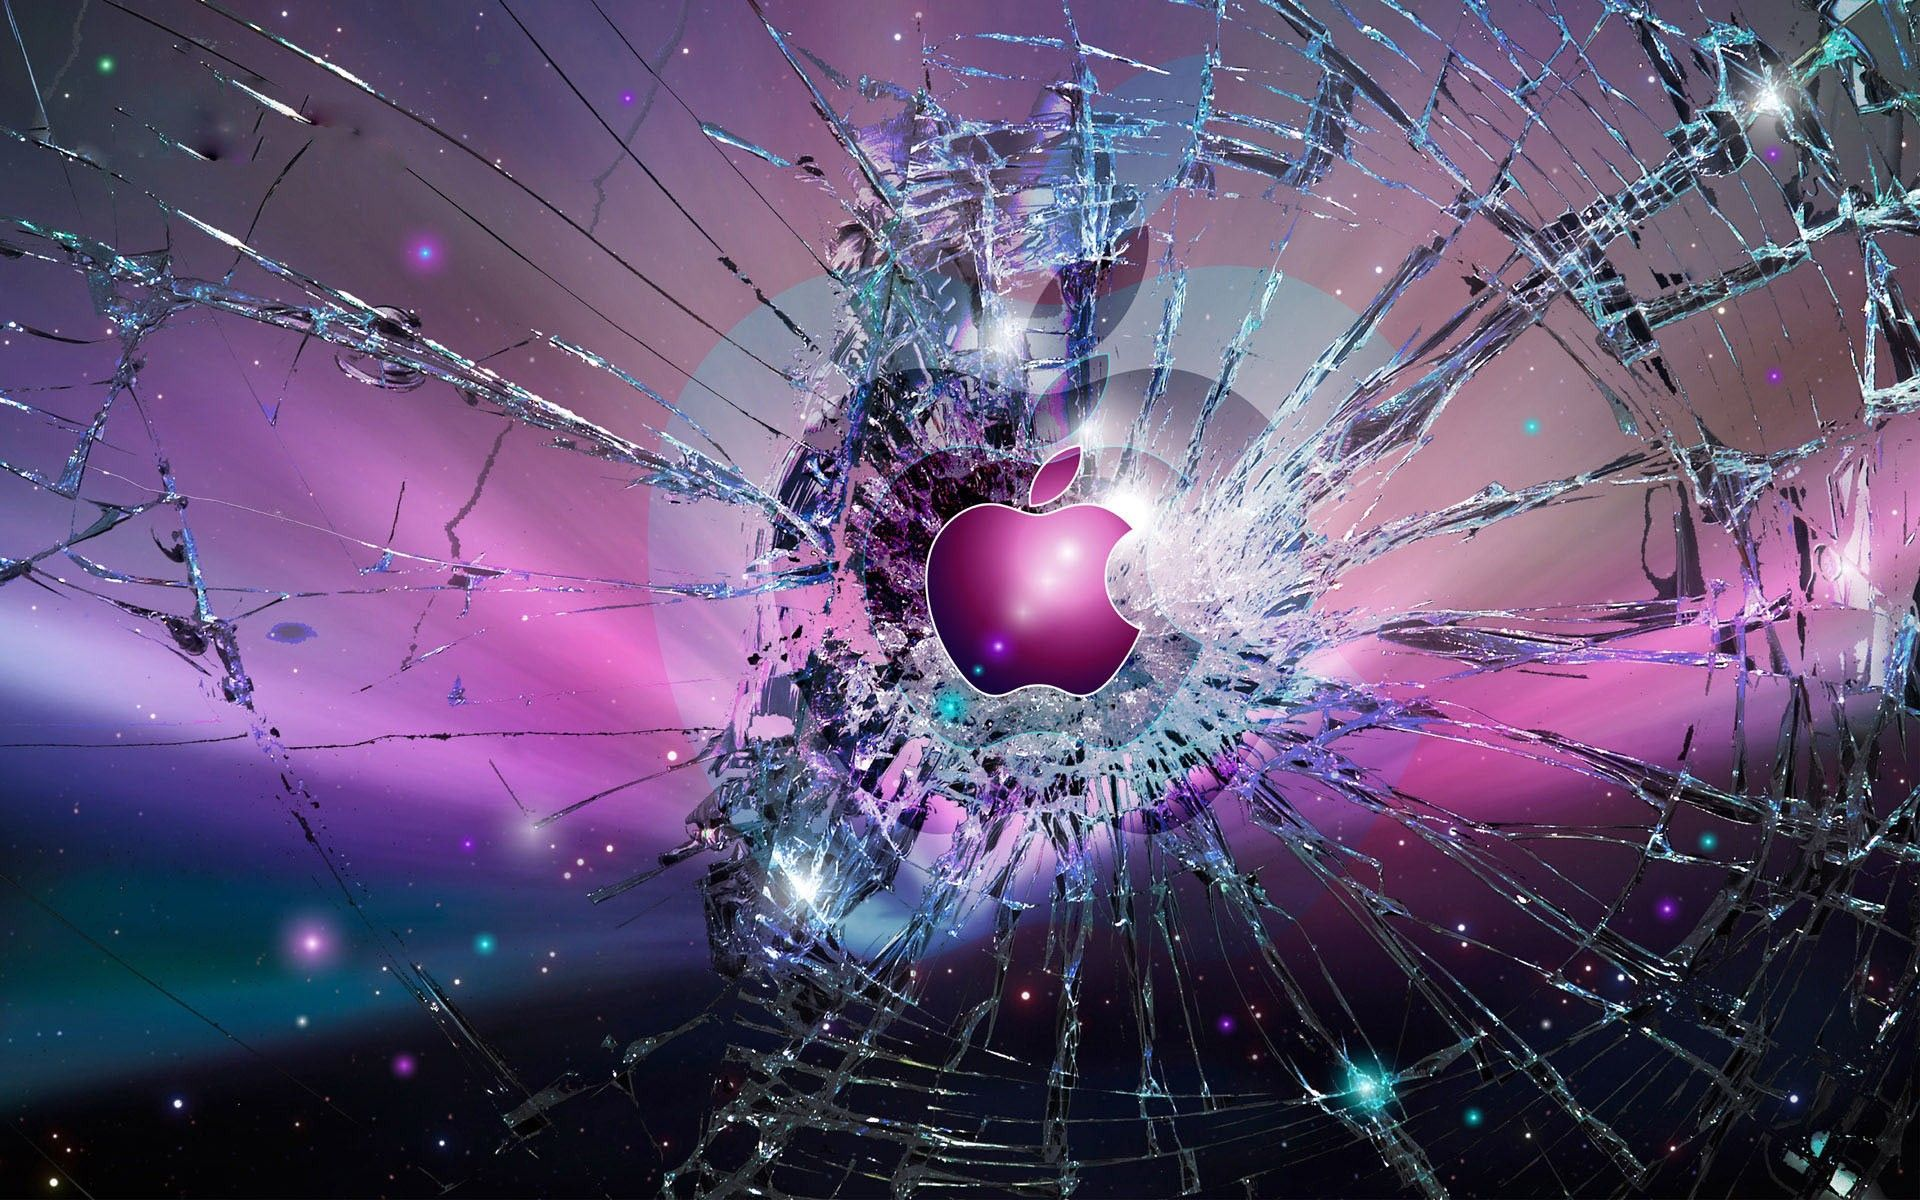 Best Mac Apple Logo Wallpaper Apple wallpaper iphone